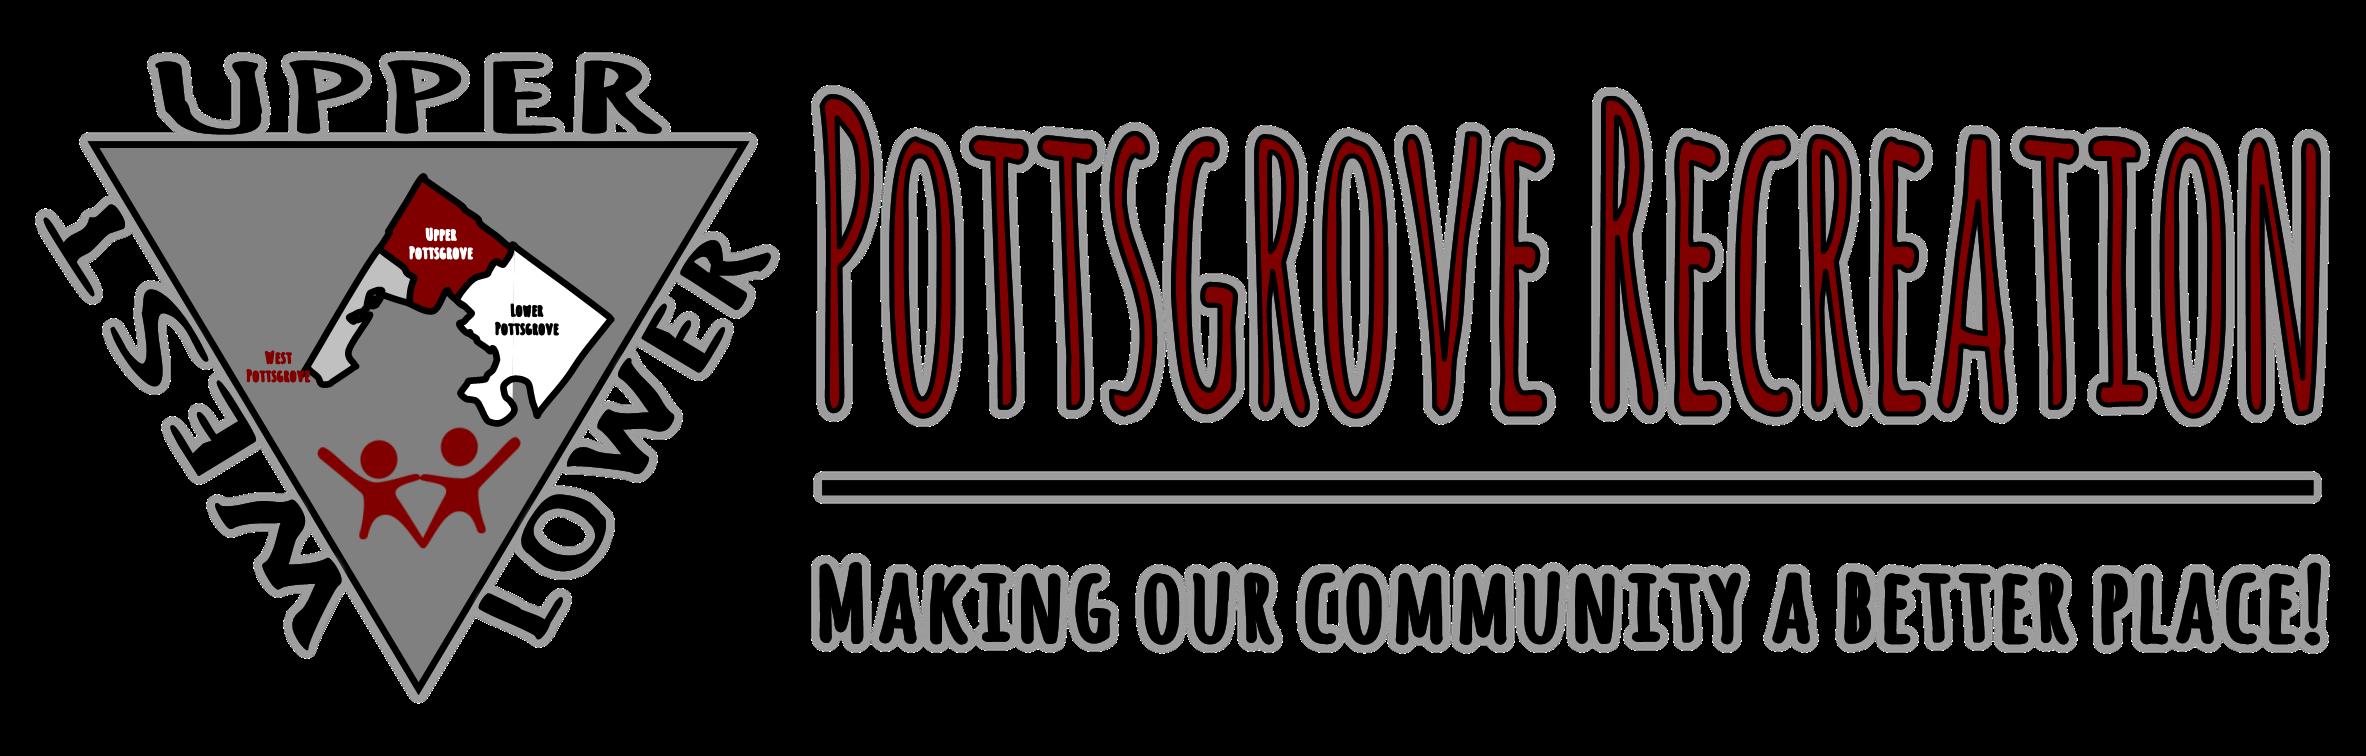 Pottsgrove Recreation Board